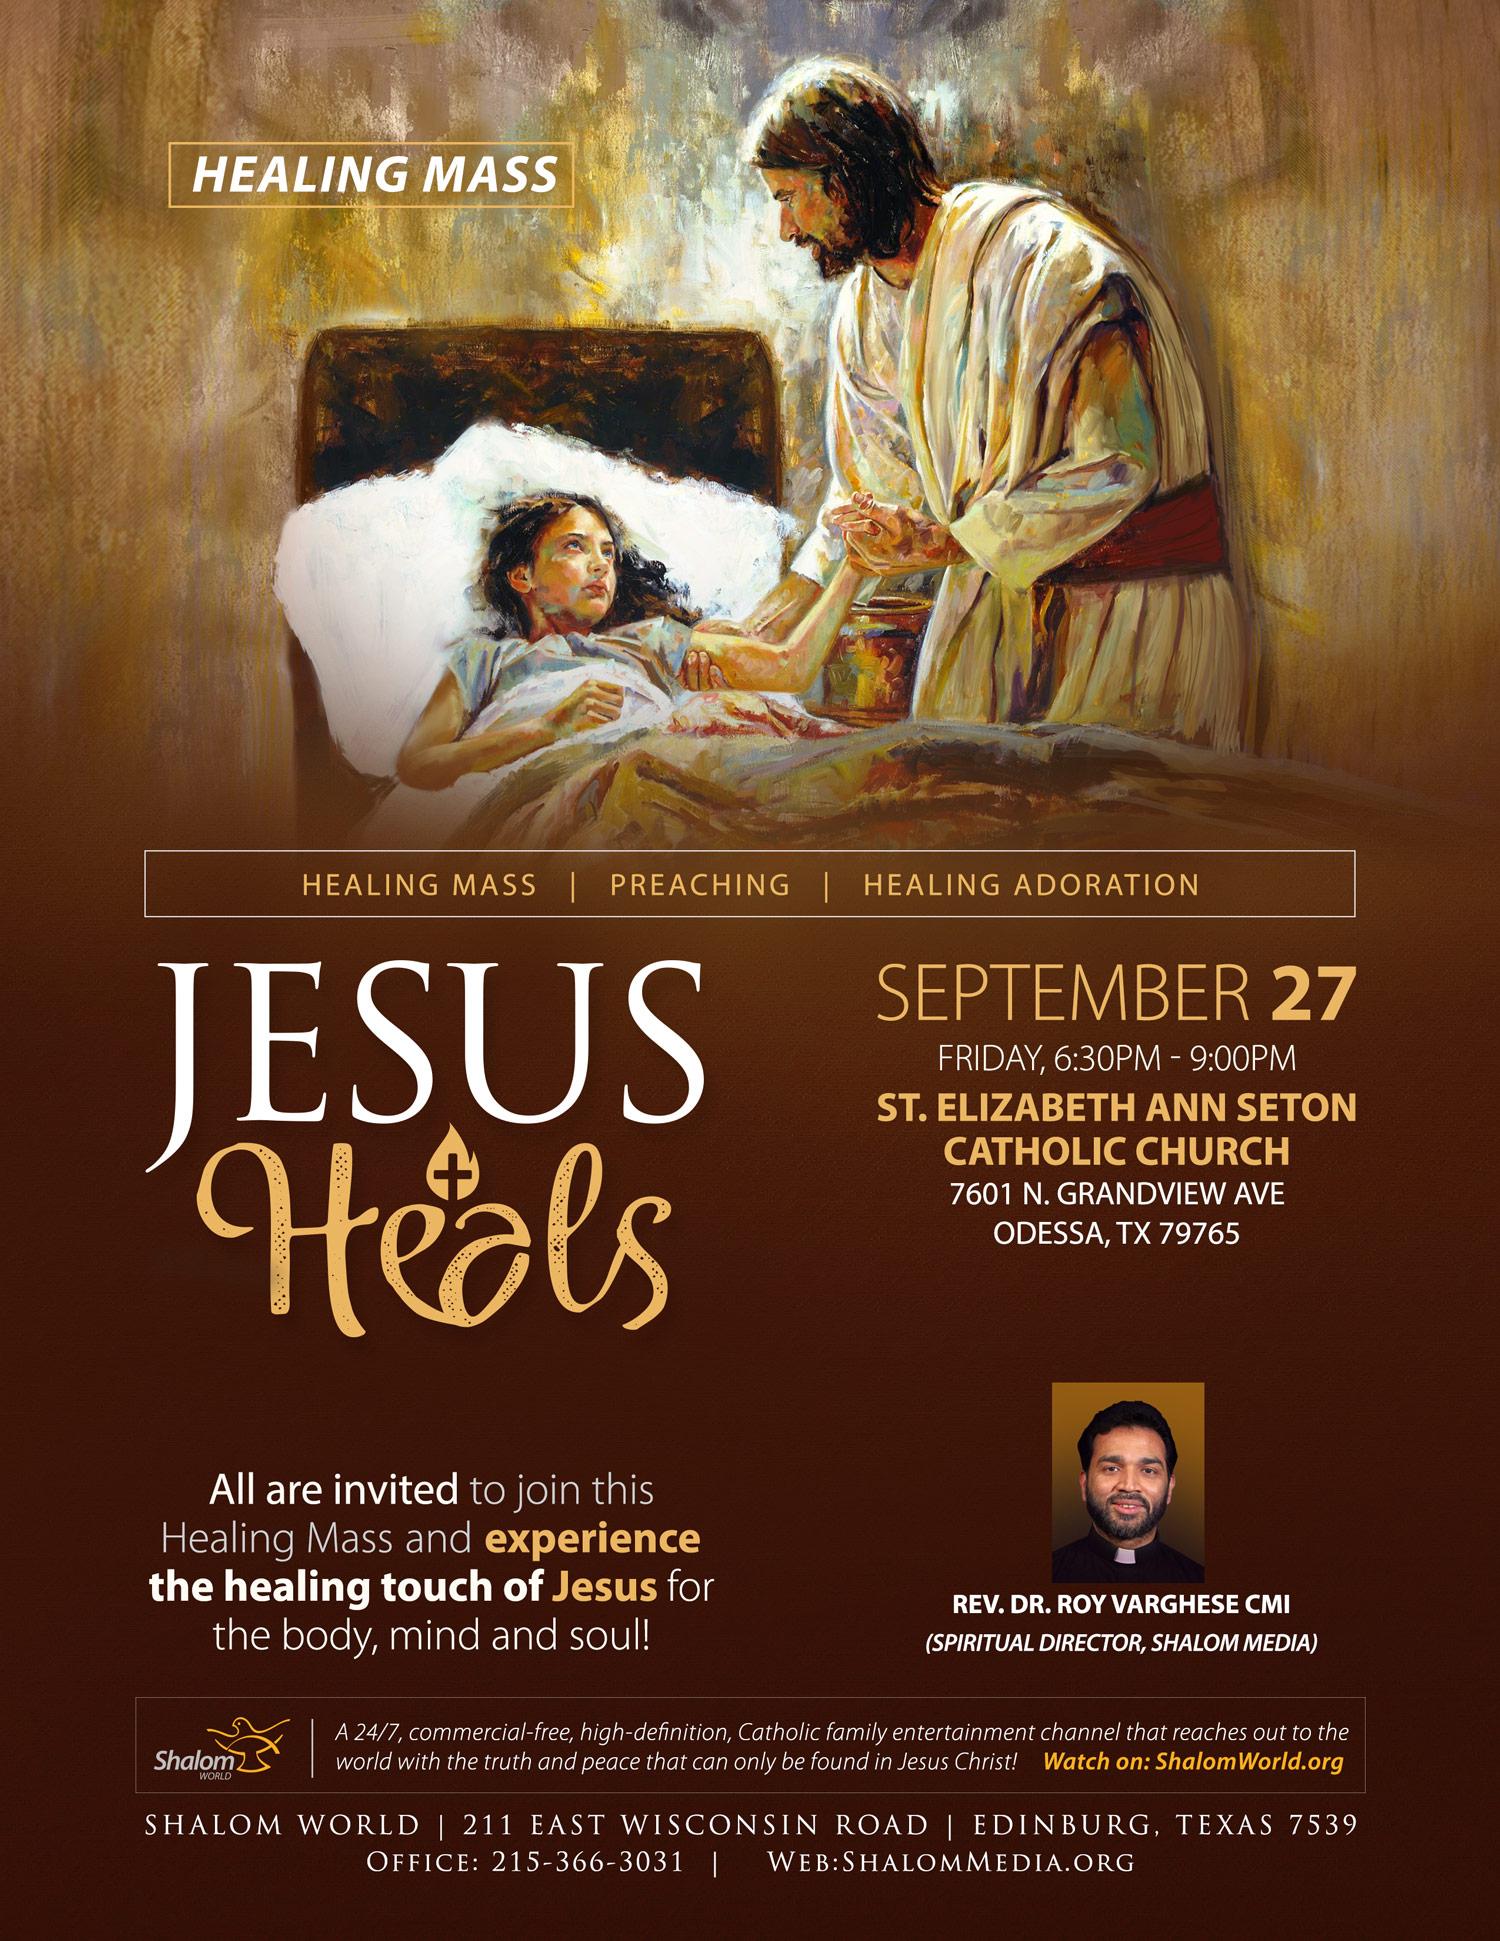 Jesus Heals - Shalom Media